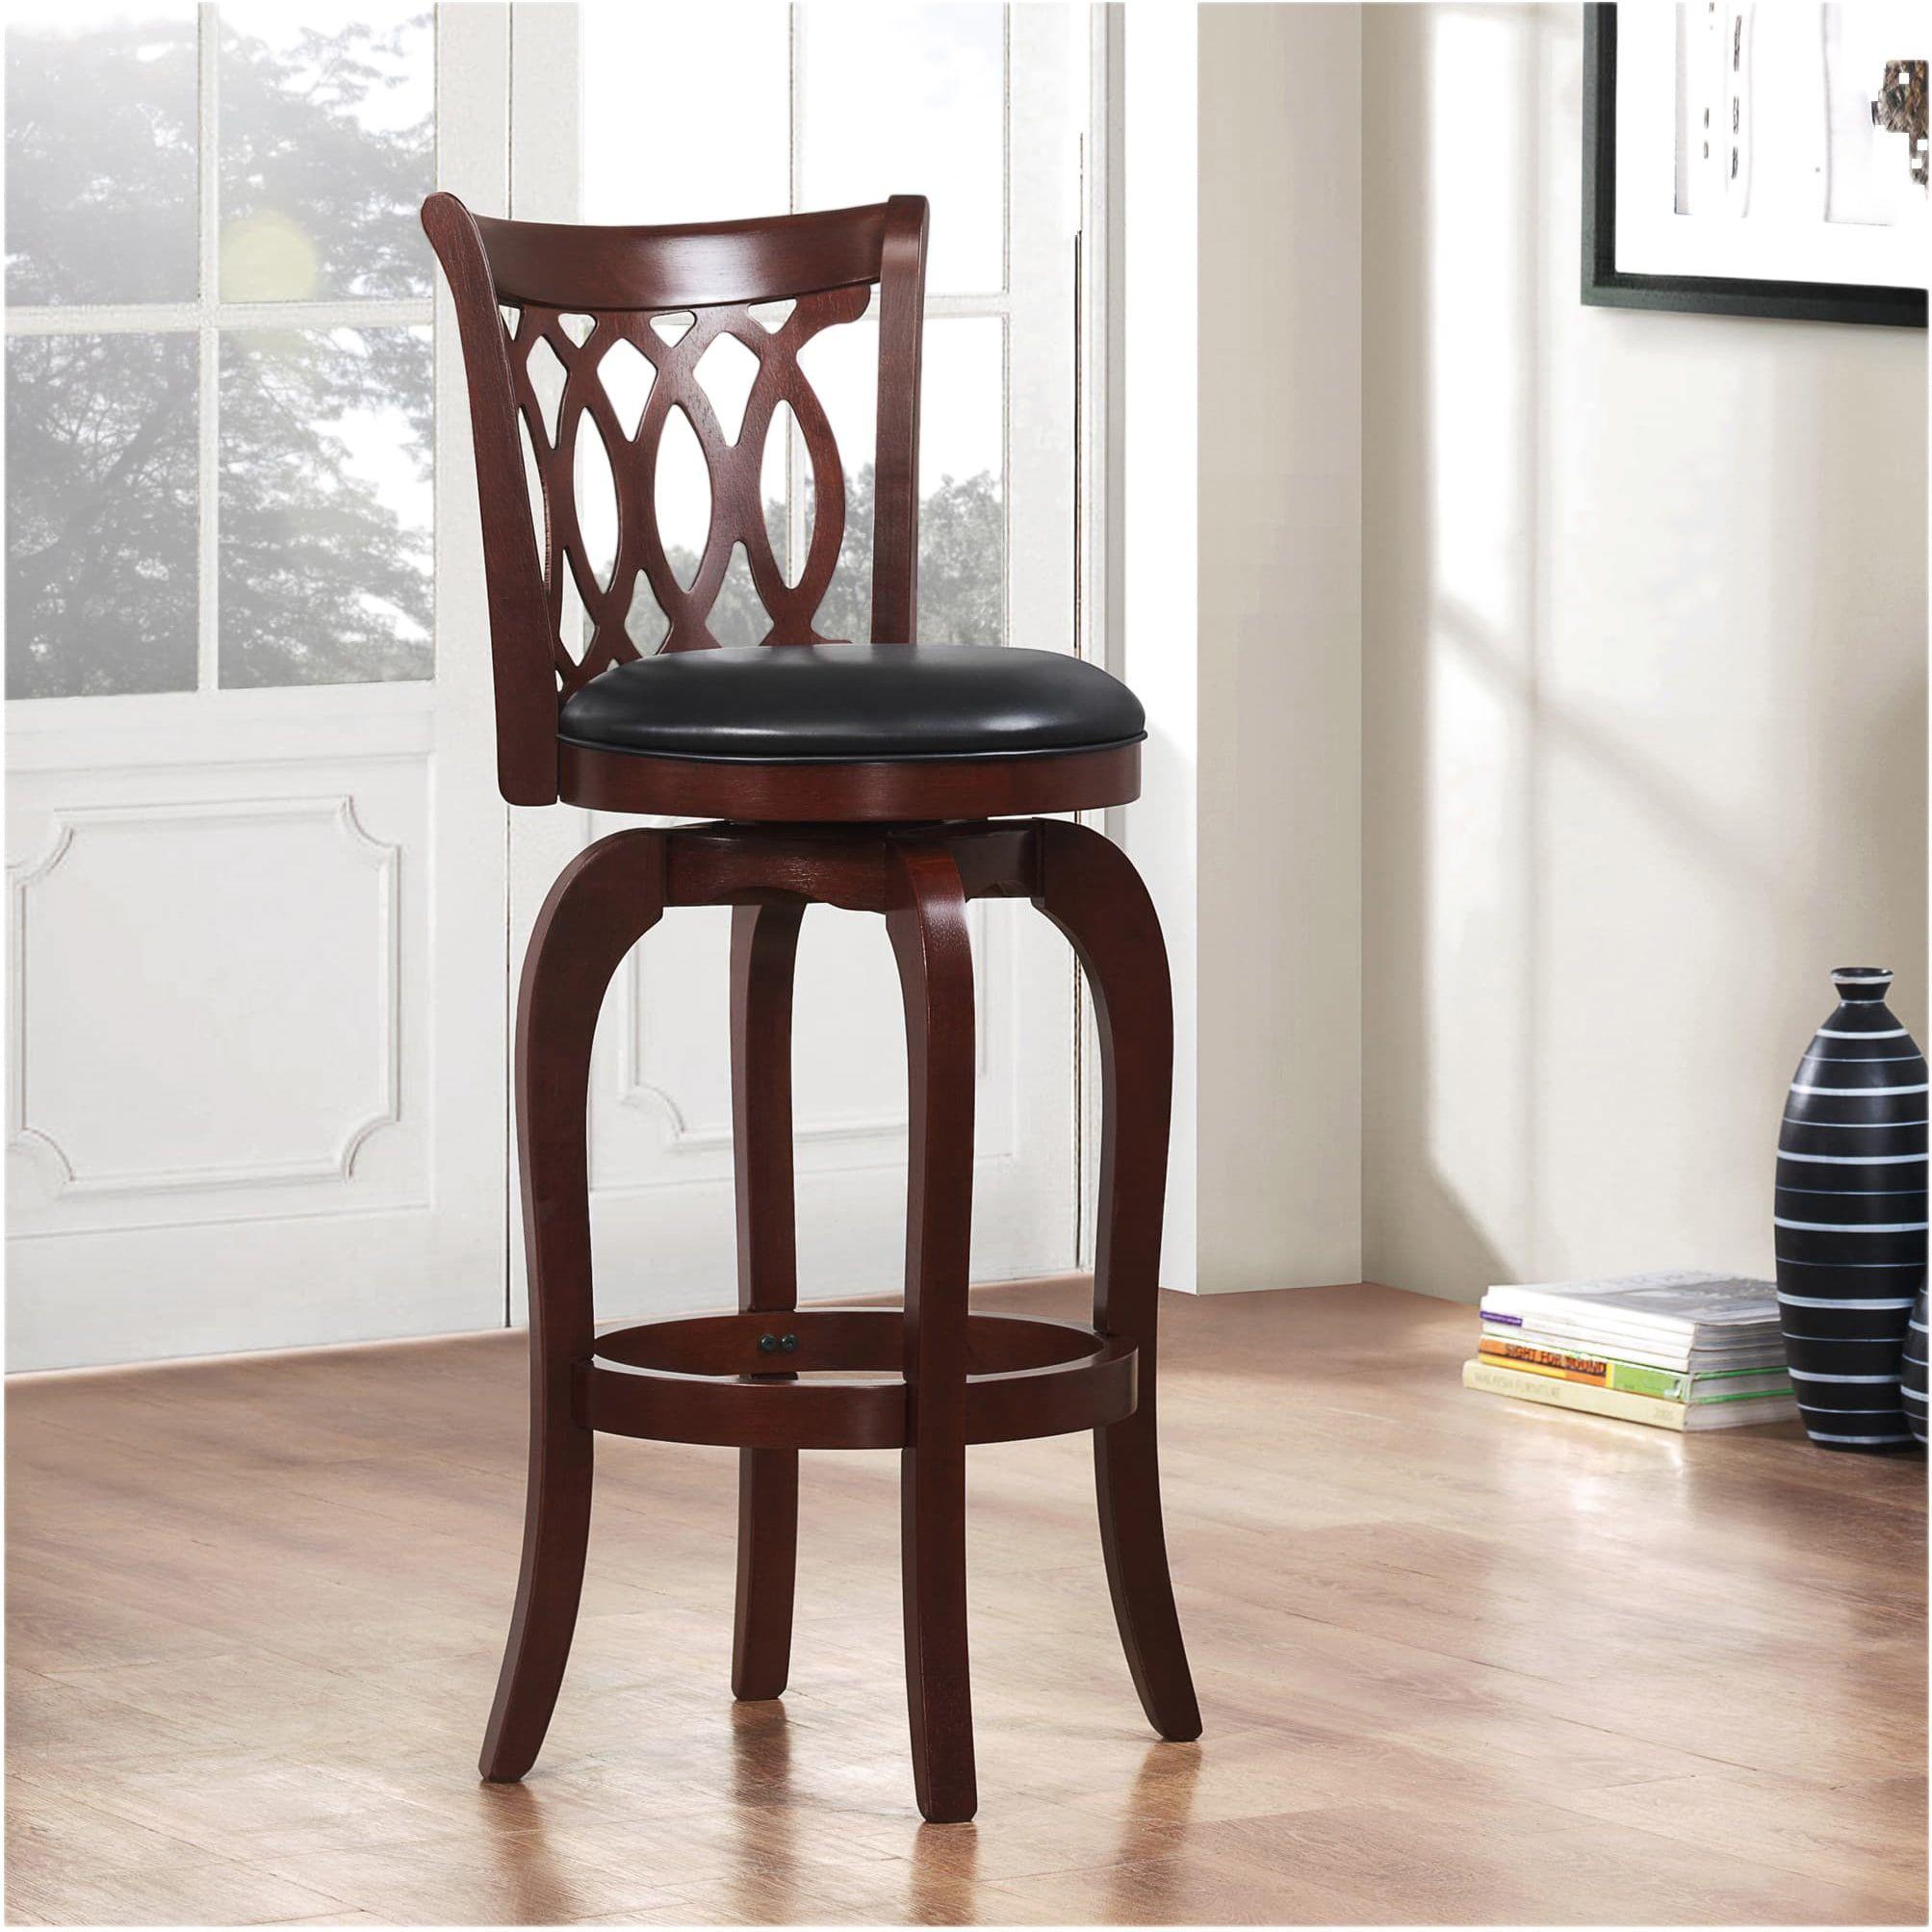 Groovy Verona Cherry Swivel 29 Inch High Back Barstool By Inspire Q Dailytribune Chair Design For Home Dailytribuneorg